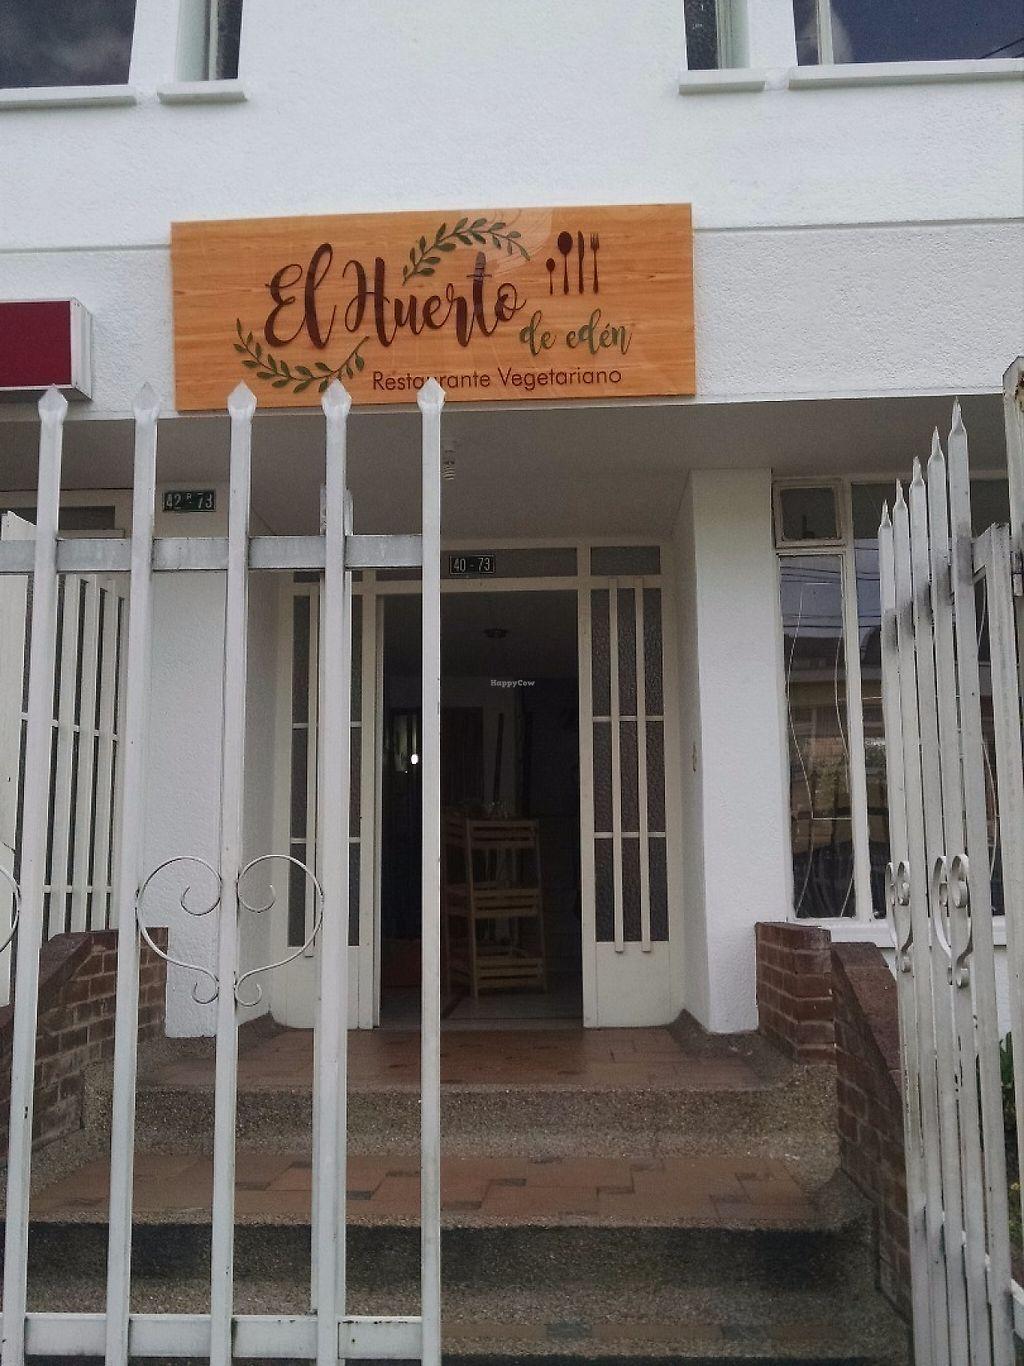 "Photo of El Huerto de Edén  by <a href=""/members/profile/veggiegringa"">veggiegringa</a> <br/>Restaurant entrance <br/> May 27, 2017  - <a href='/contact/abuse/image/92892/262881'>Report</a>"